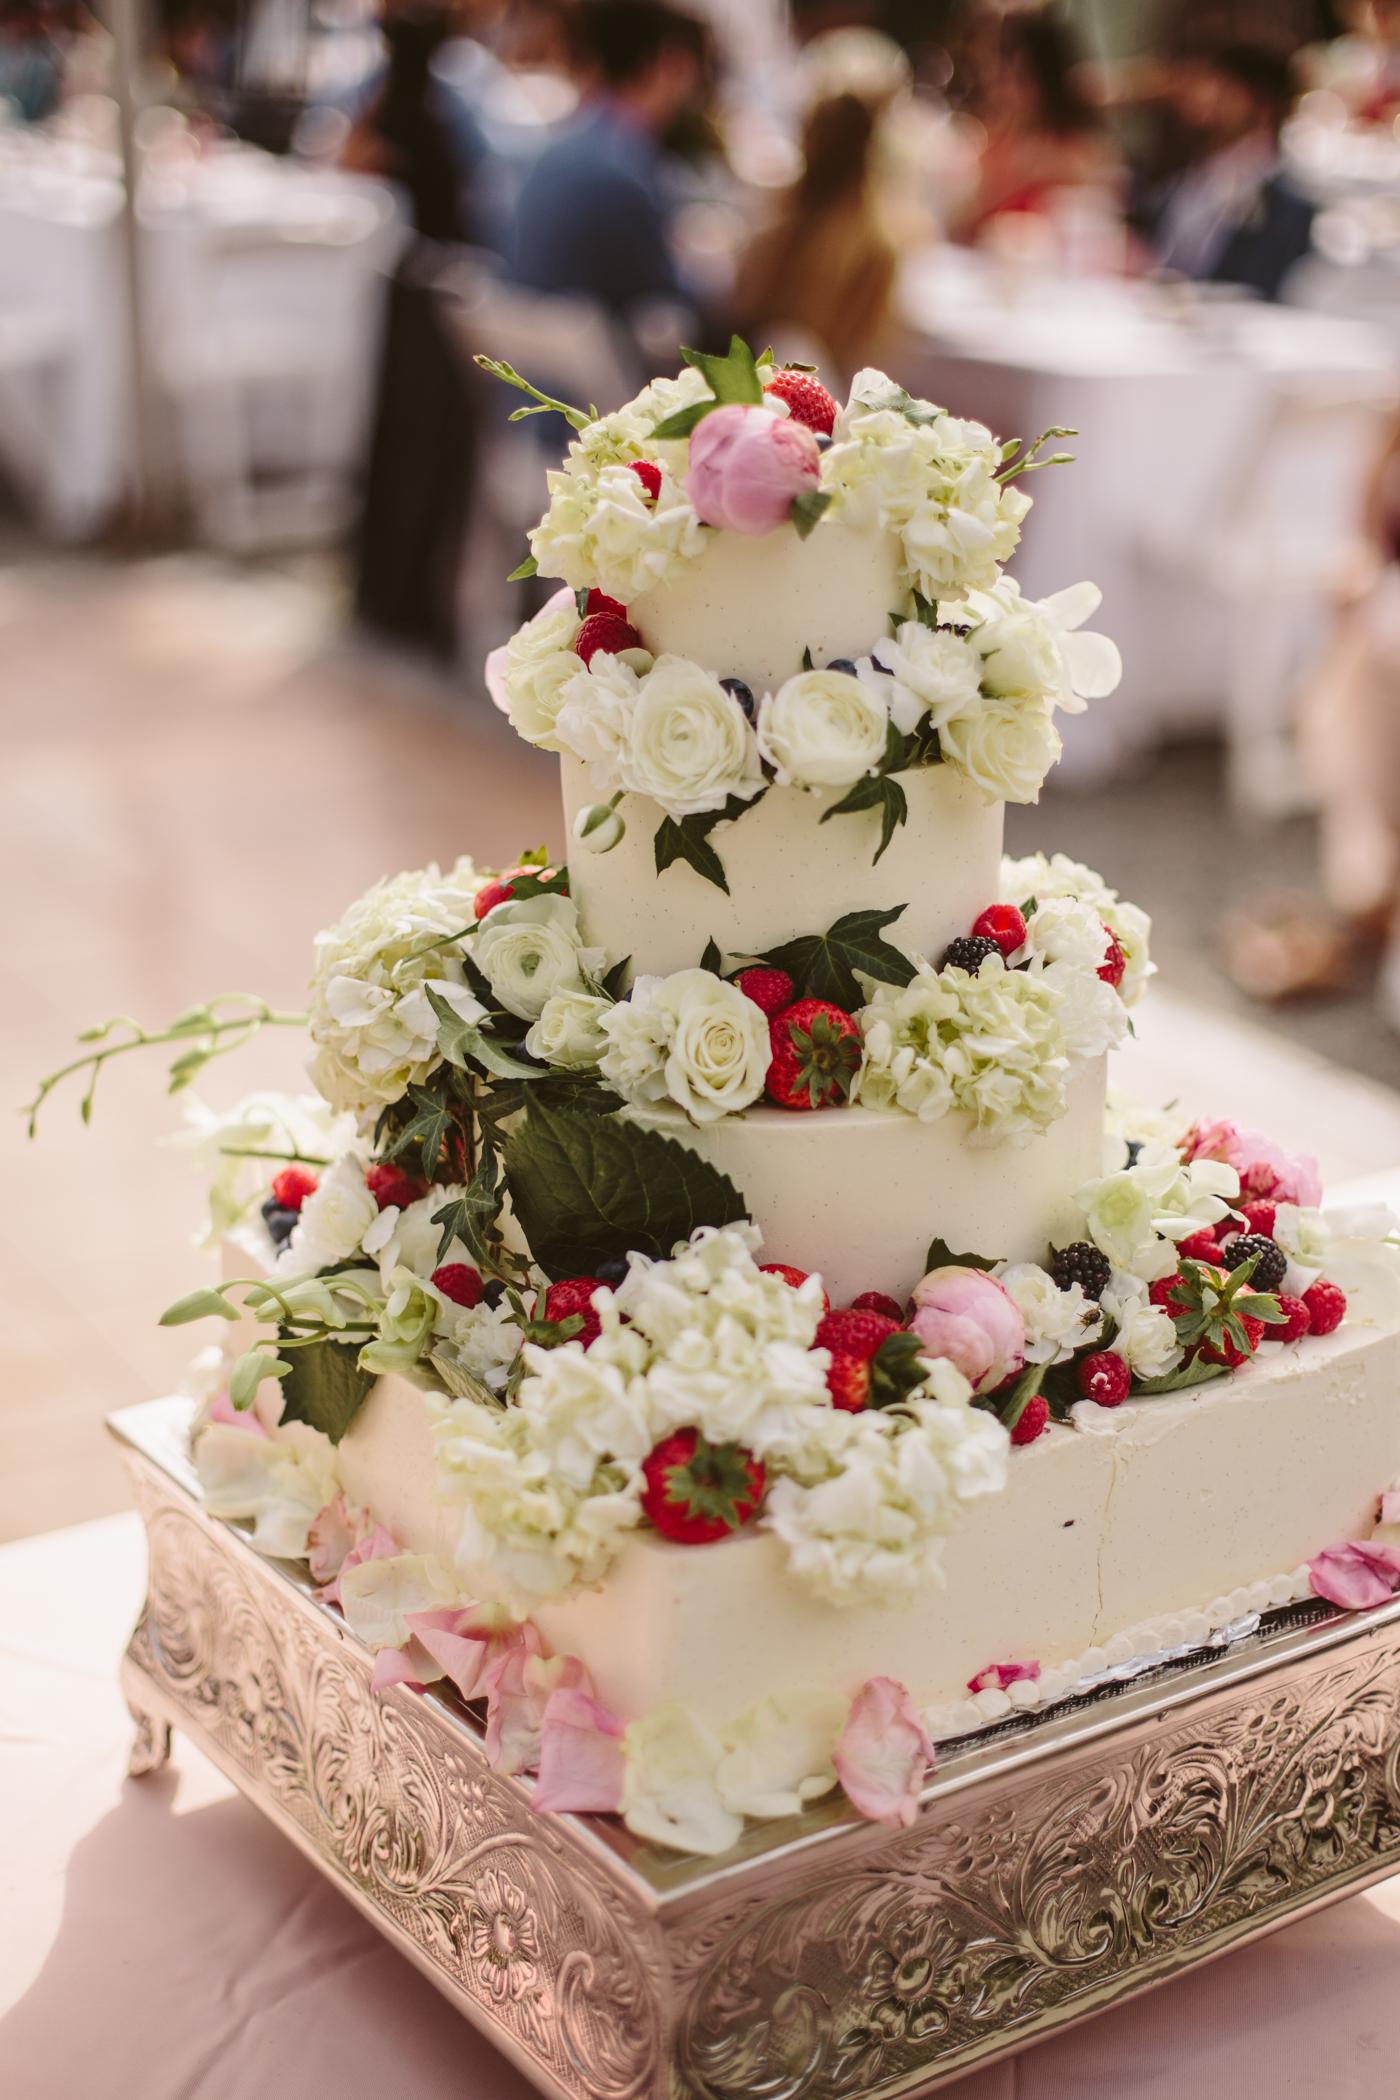 Fire Island Bakery Wedding Cake